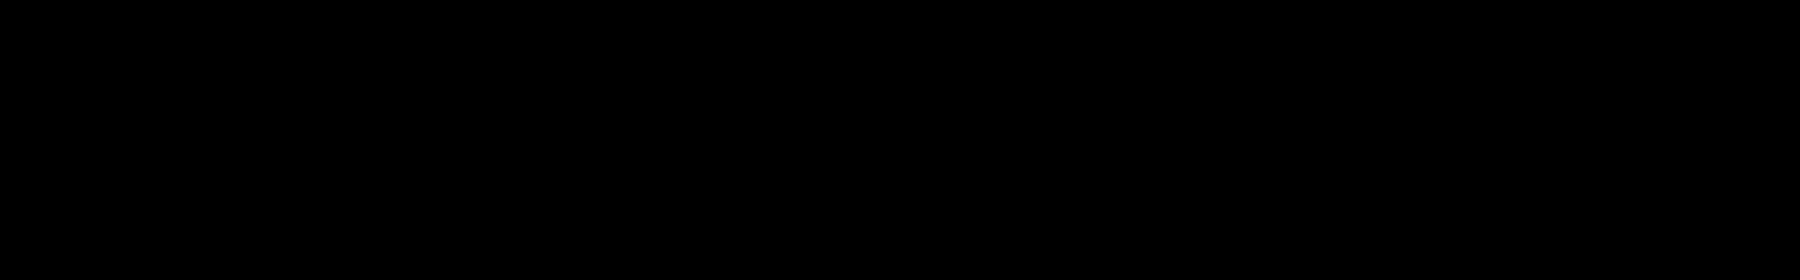 Dark Analogue Techno audio waveform